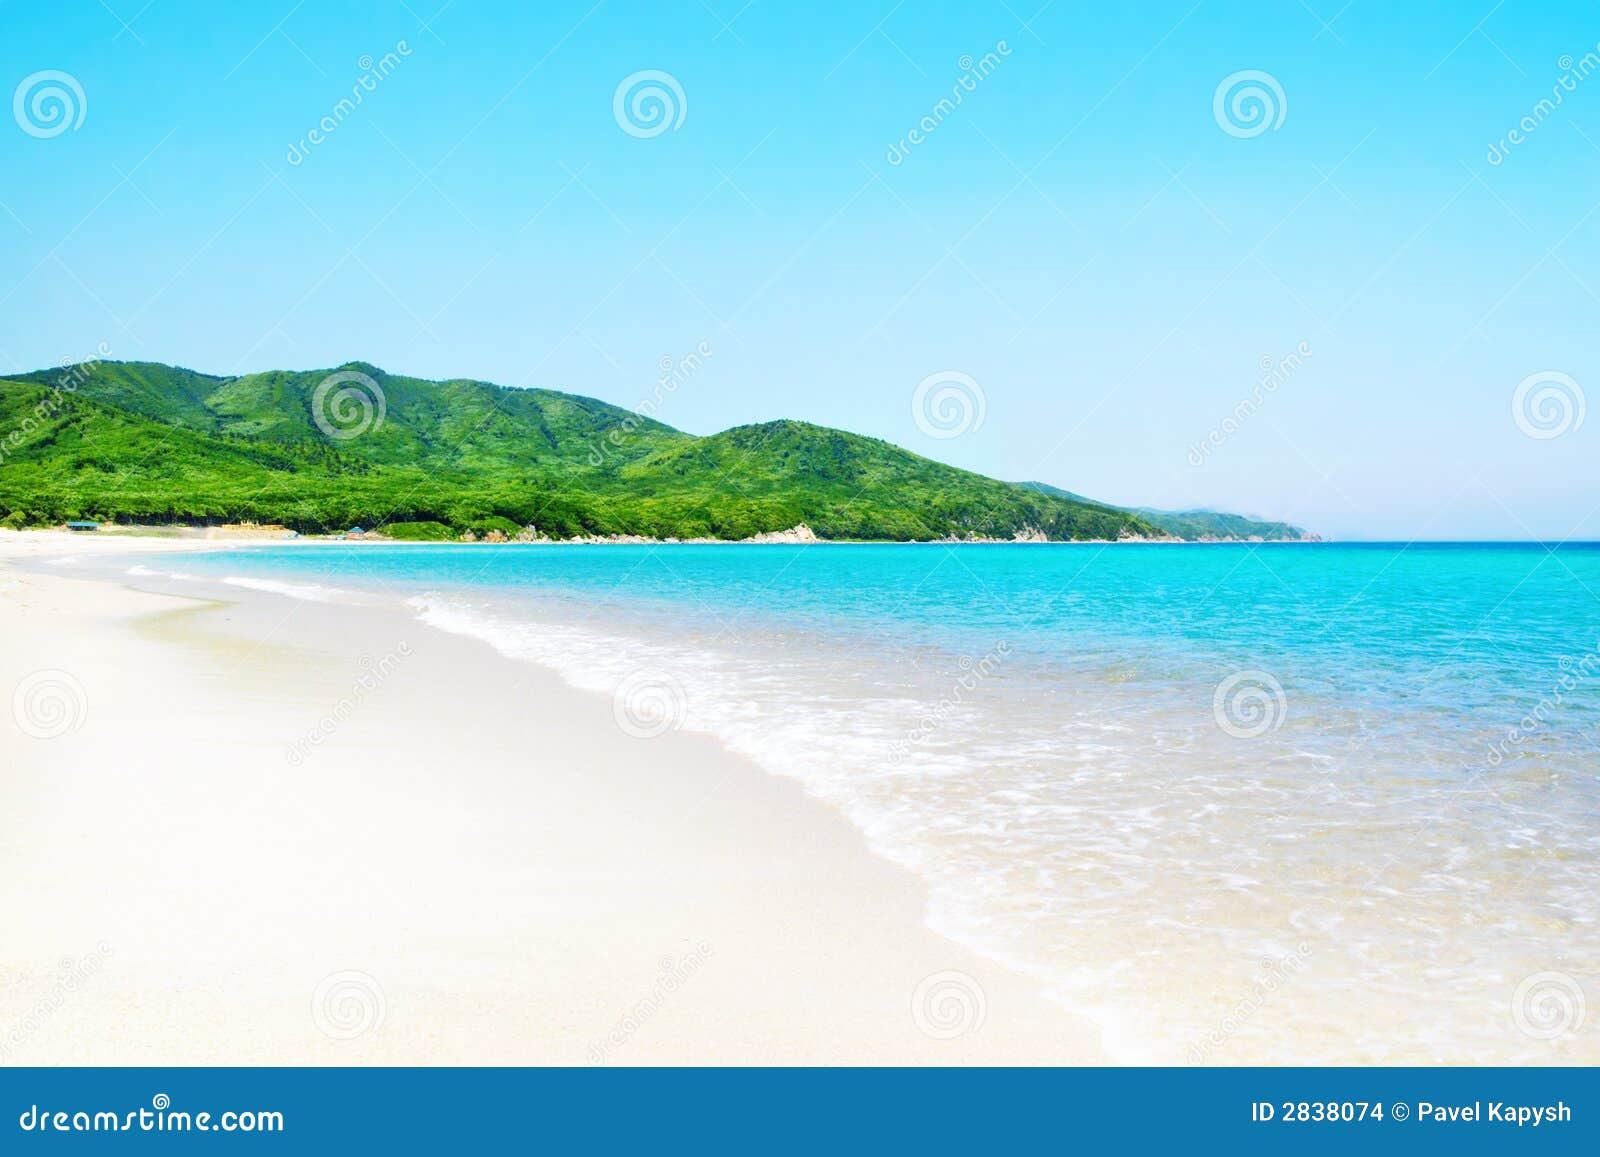 Tropical White Sunny Beach